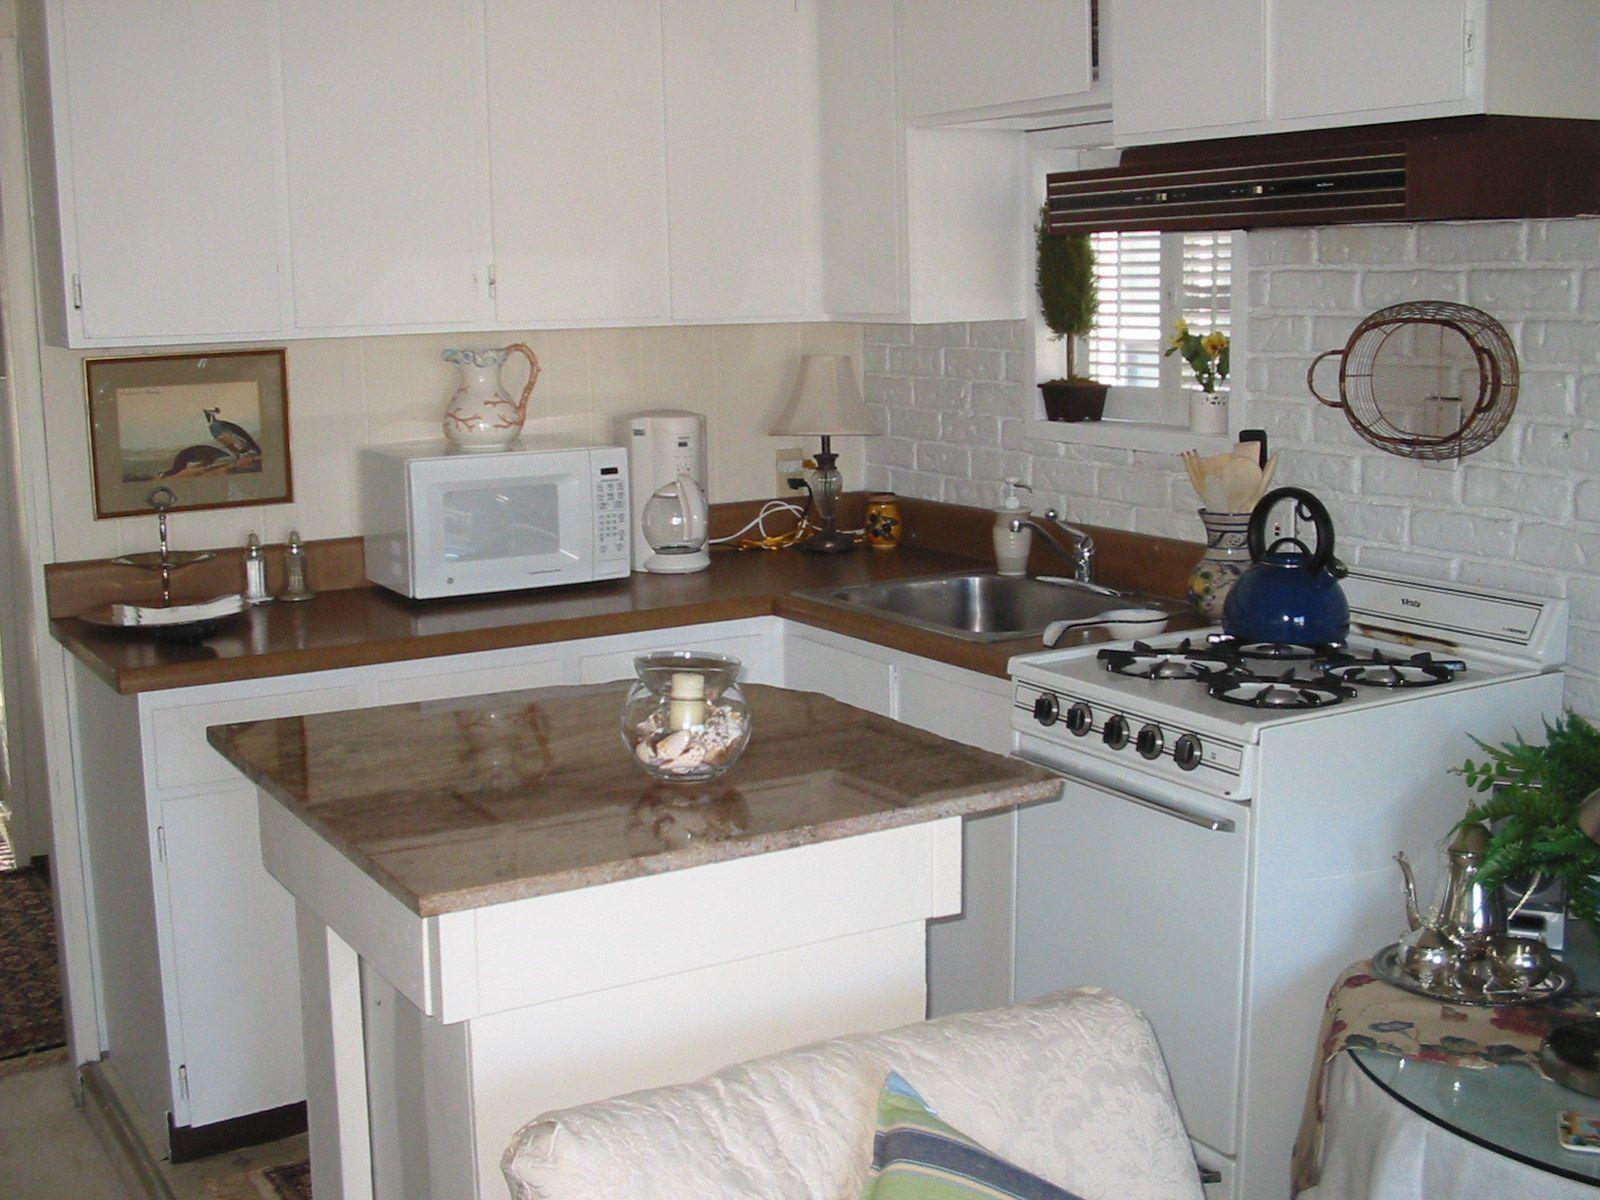 Sausalito houseboat kitchen